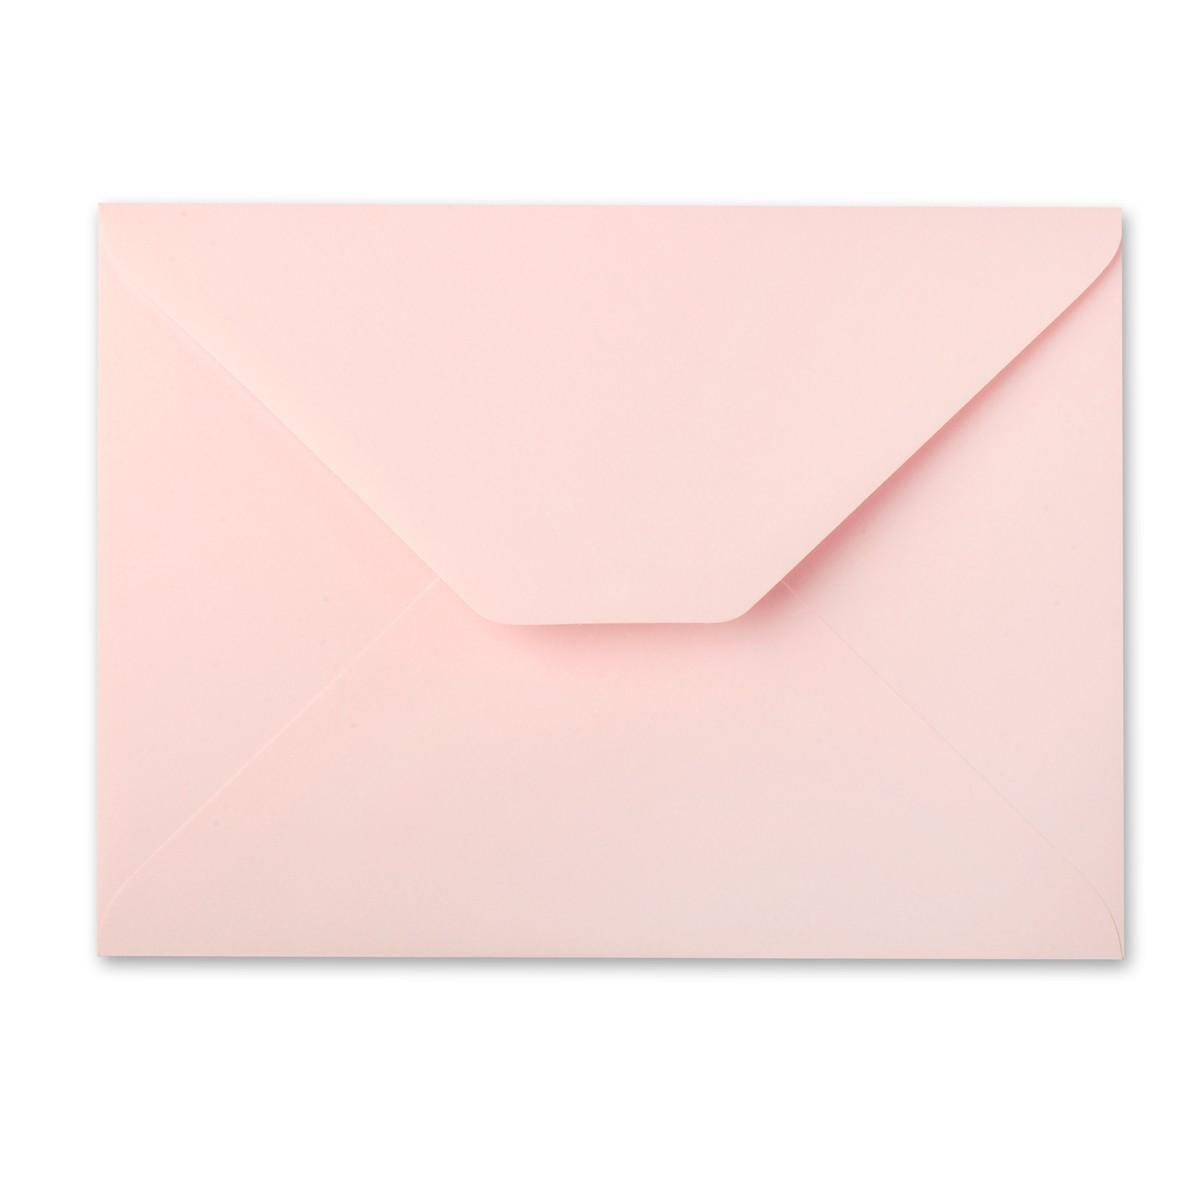 arturo pale pink grande invitation envelopes 700e 80 text 6 13